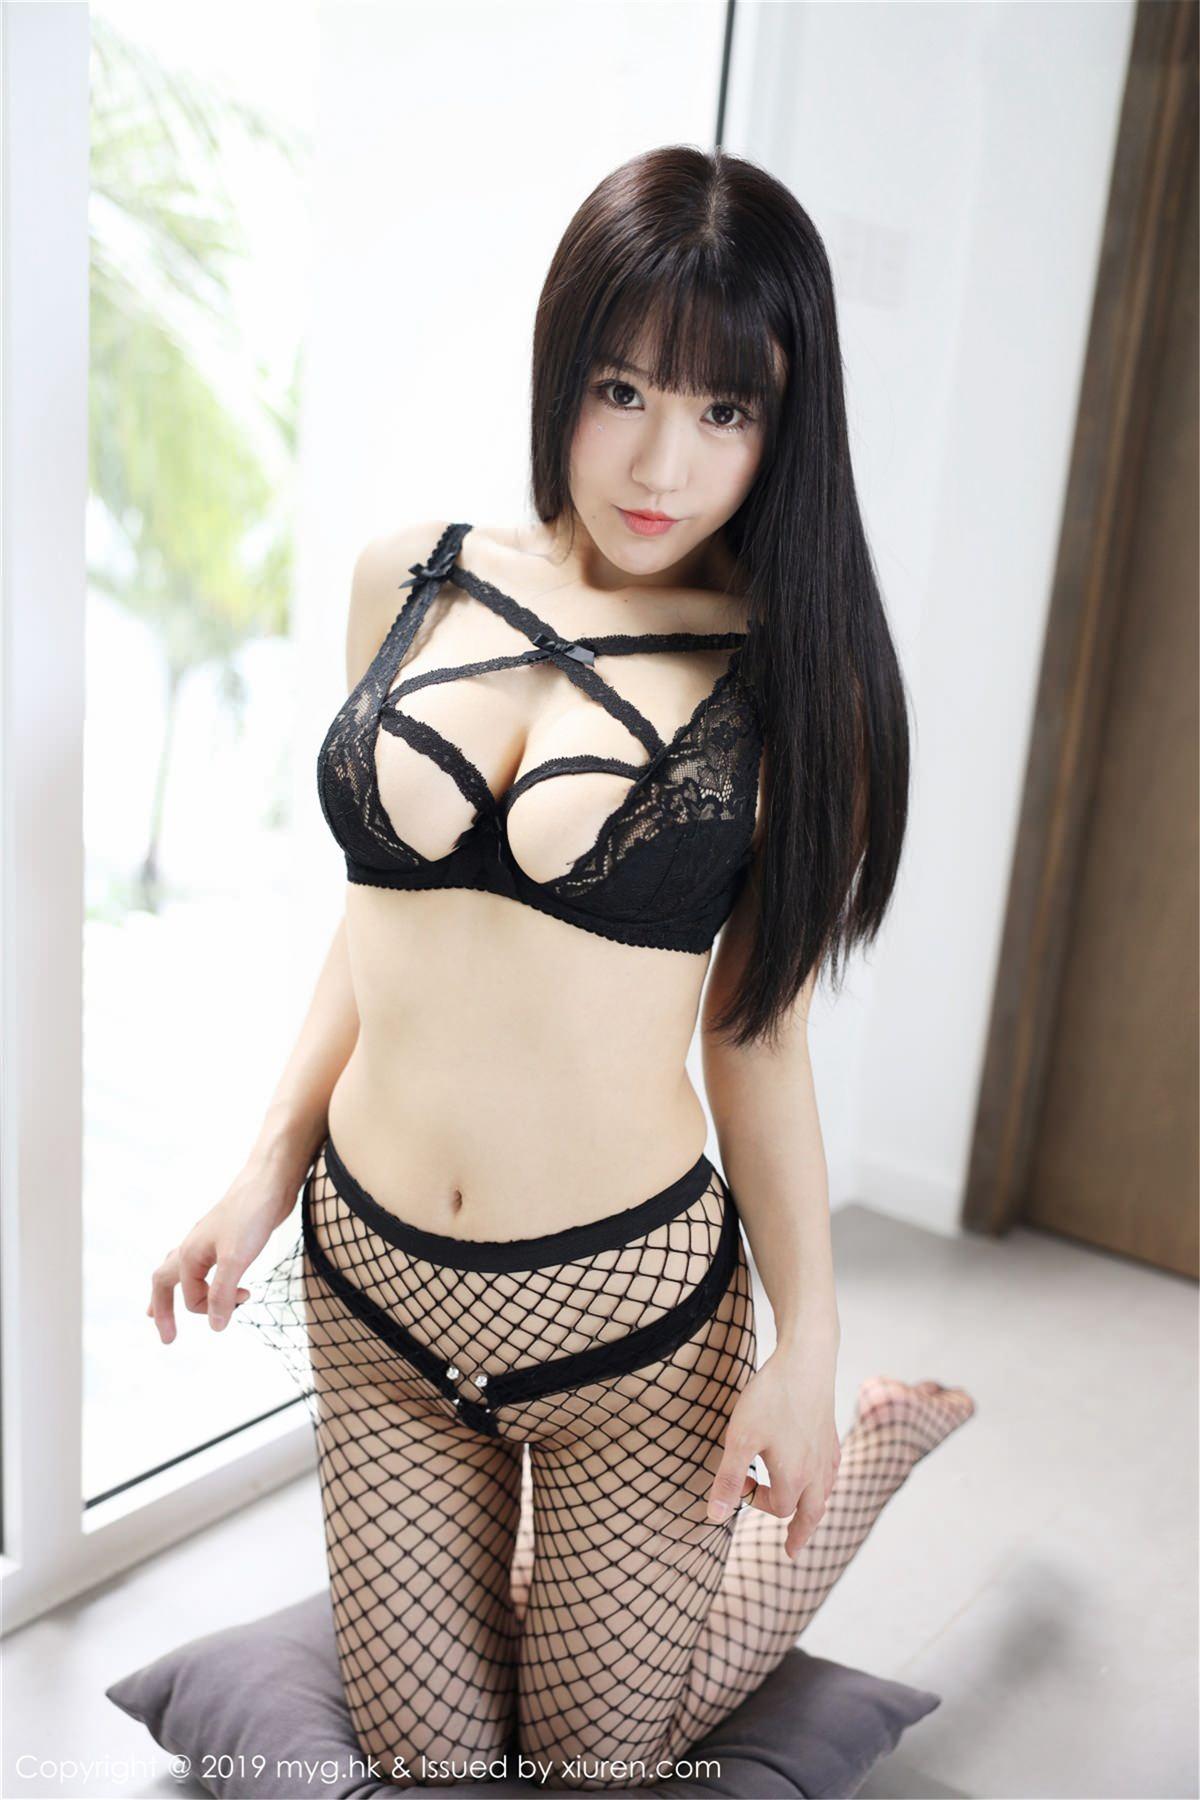 MyGirl Vol.357 19P, mygirl, Zhu Ke Er